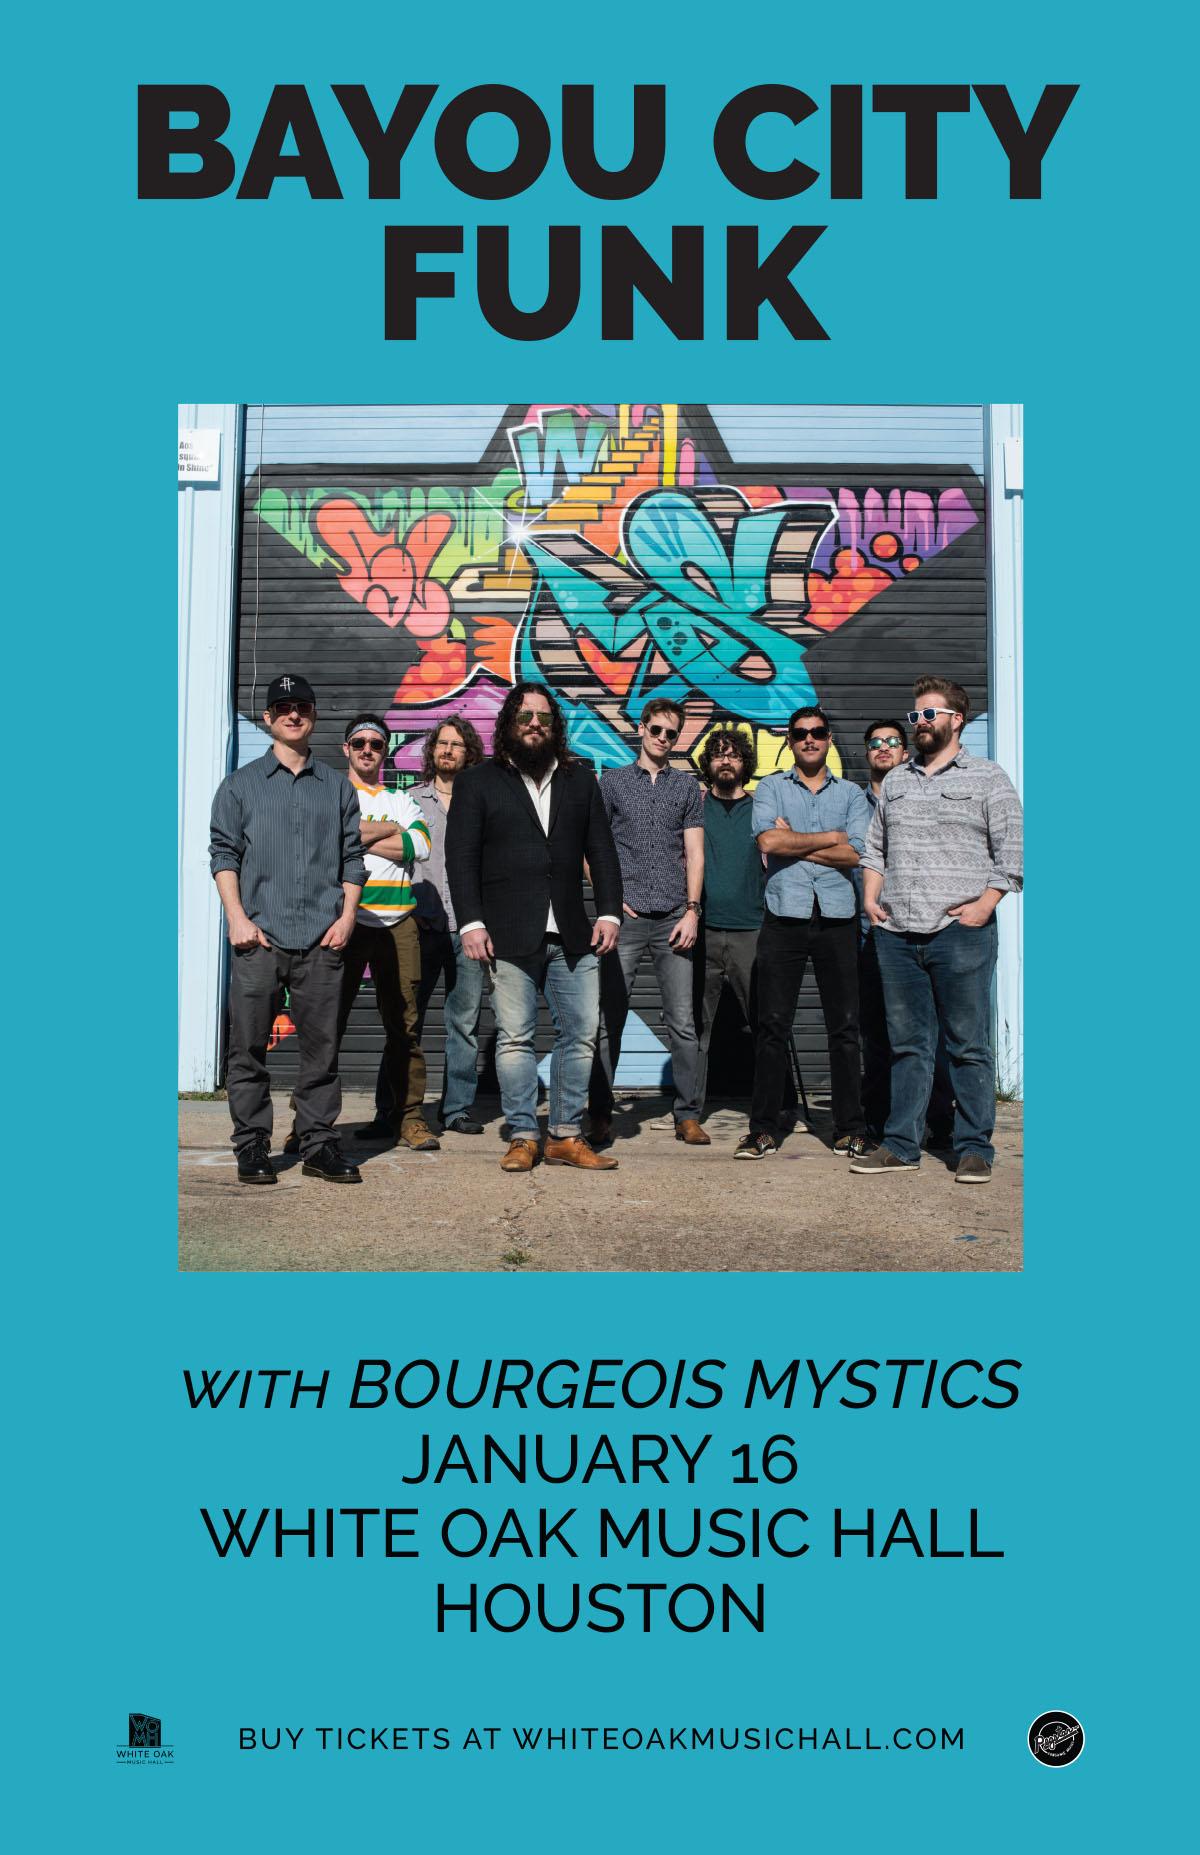 Buy Tickets to Bayou City Funk, Bourgeois Mystics in Houston